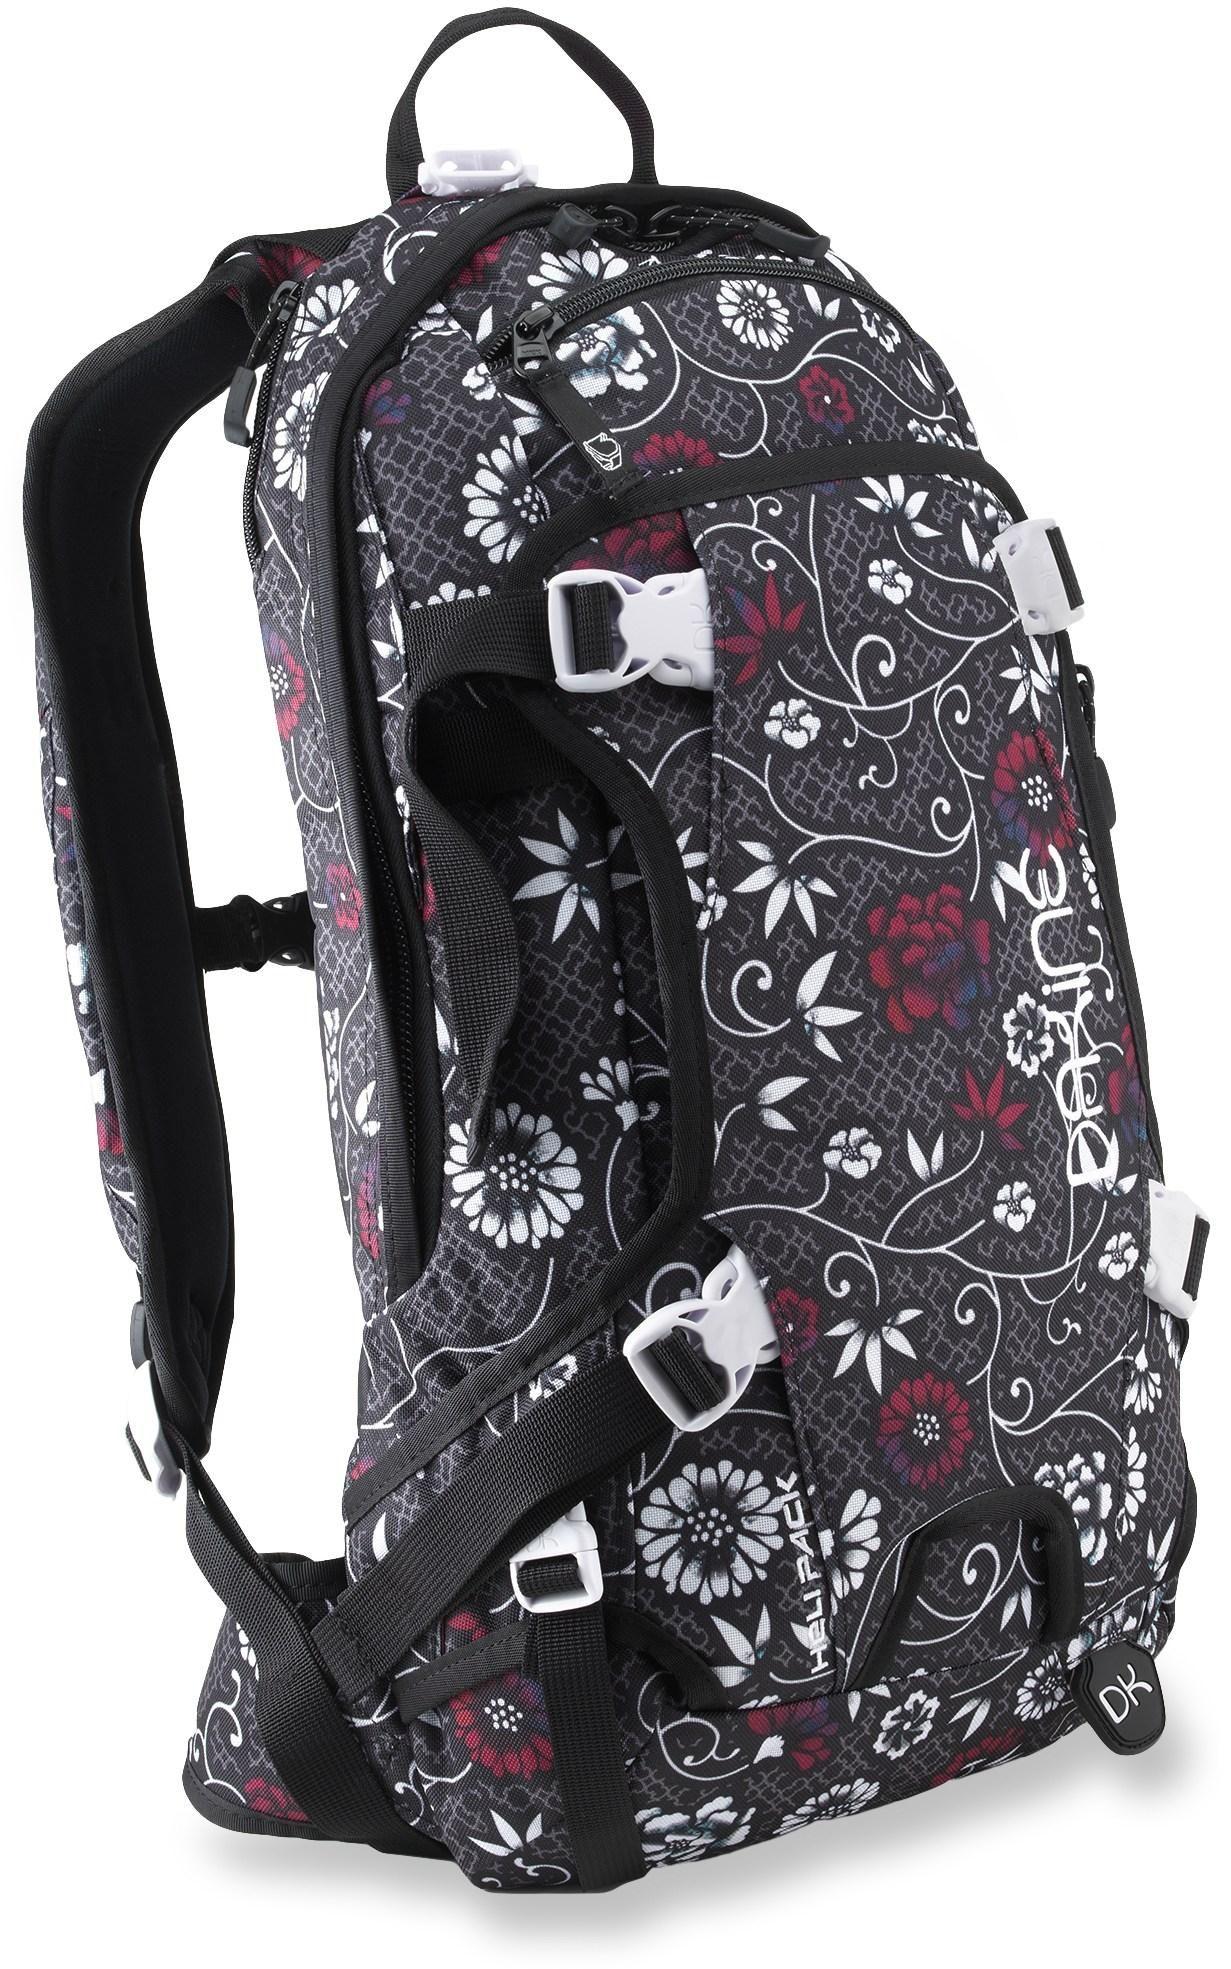 1ec30249f8783 The women s DAKINE Heli 11L snow pack features a lightweight ...